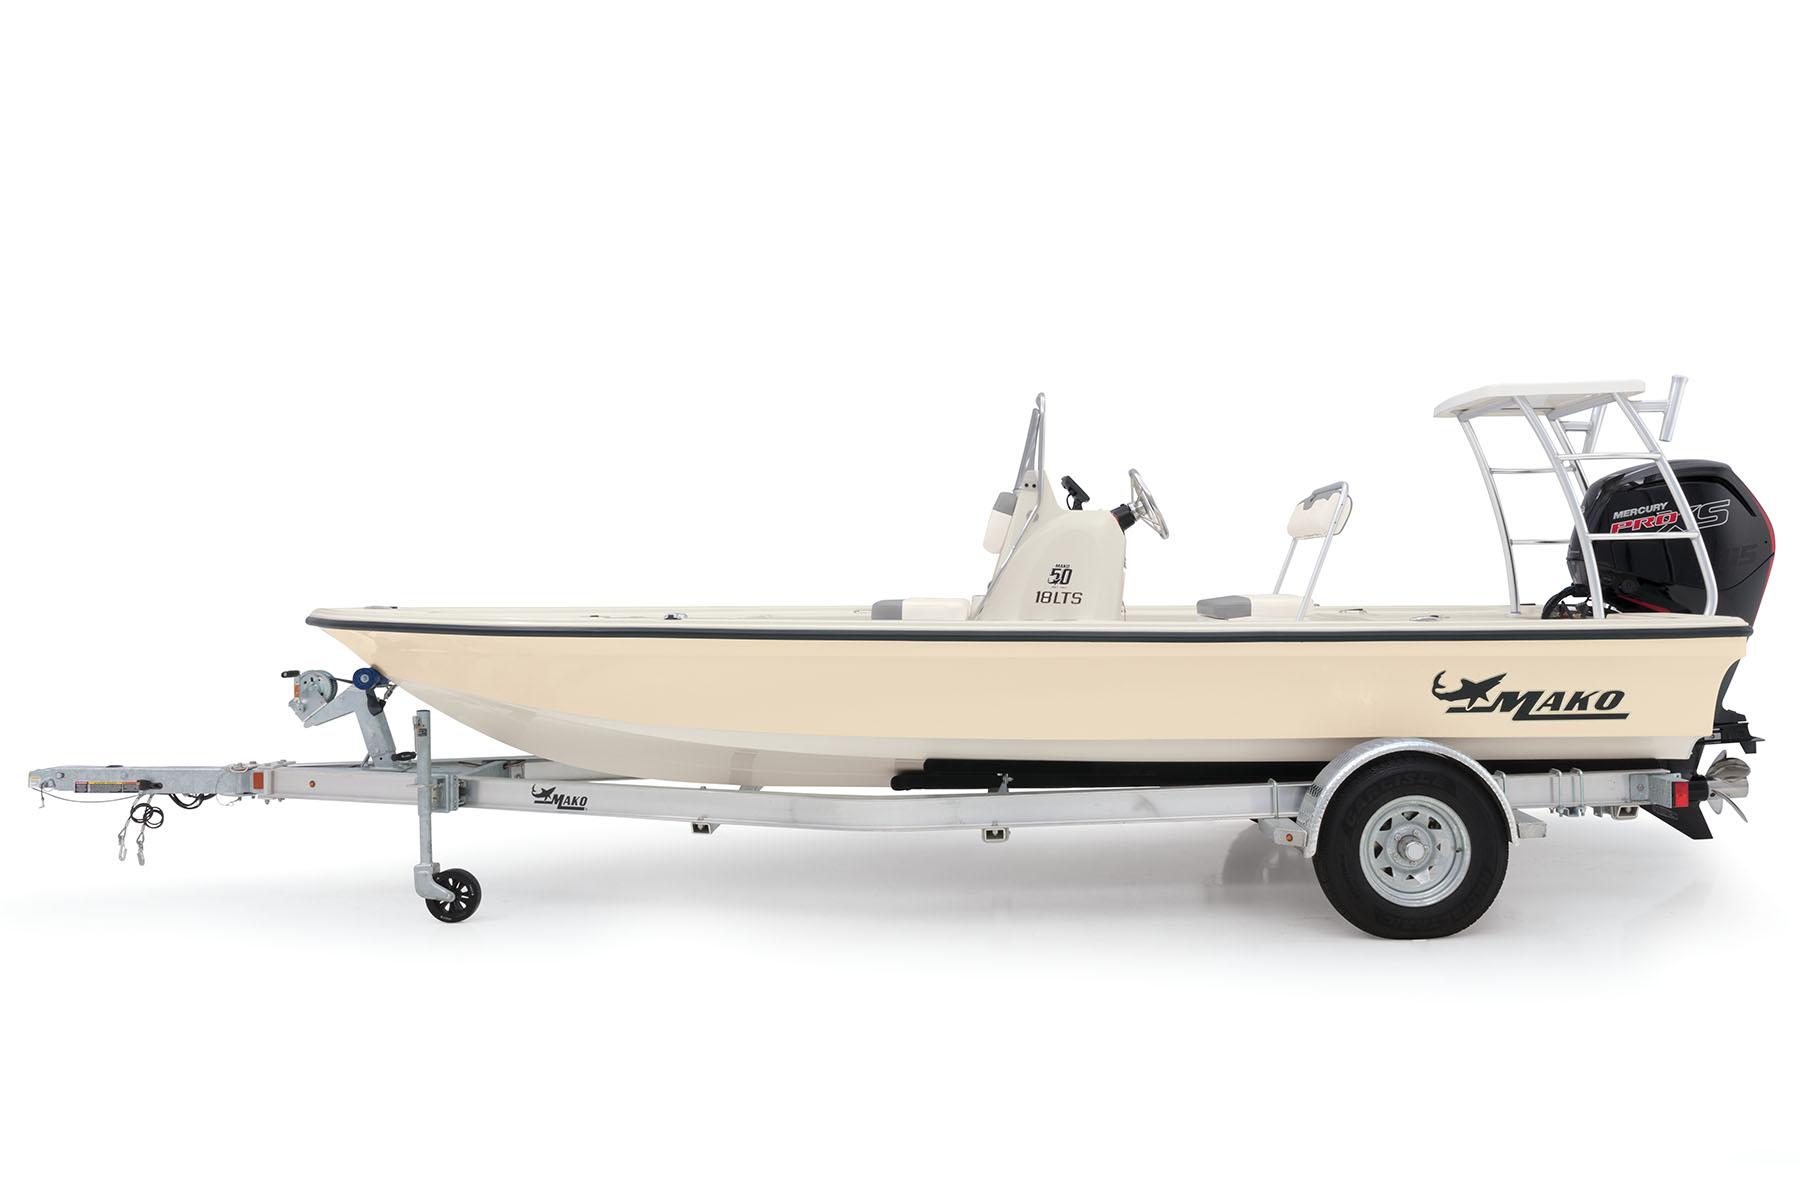 _2018_MAKO_1912018_Inshore-Boats_1942018